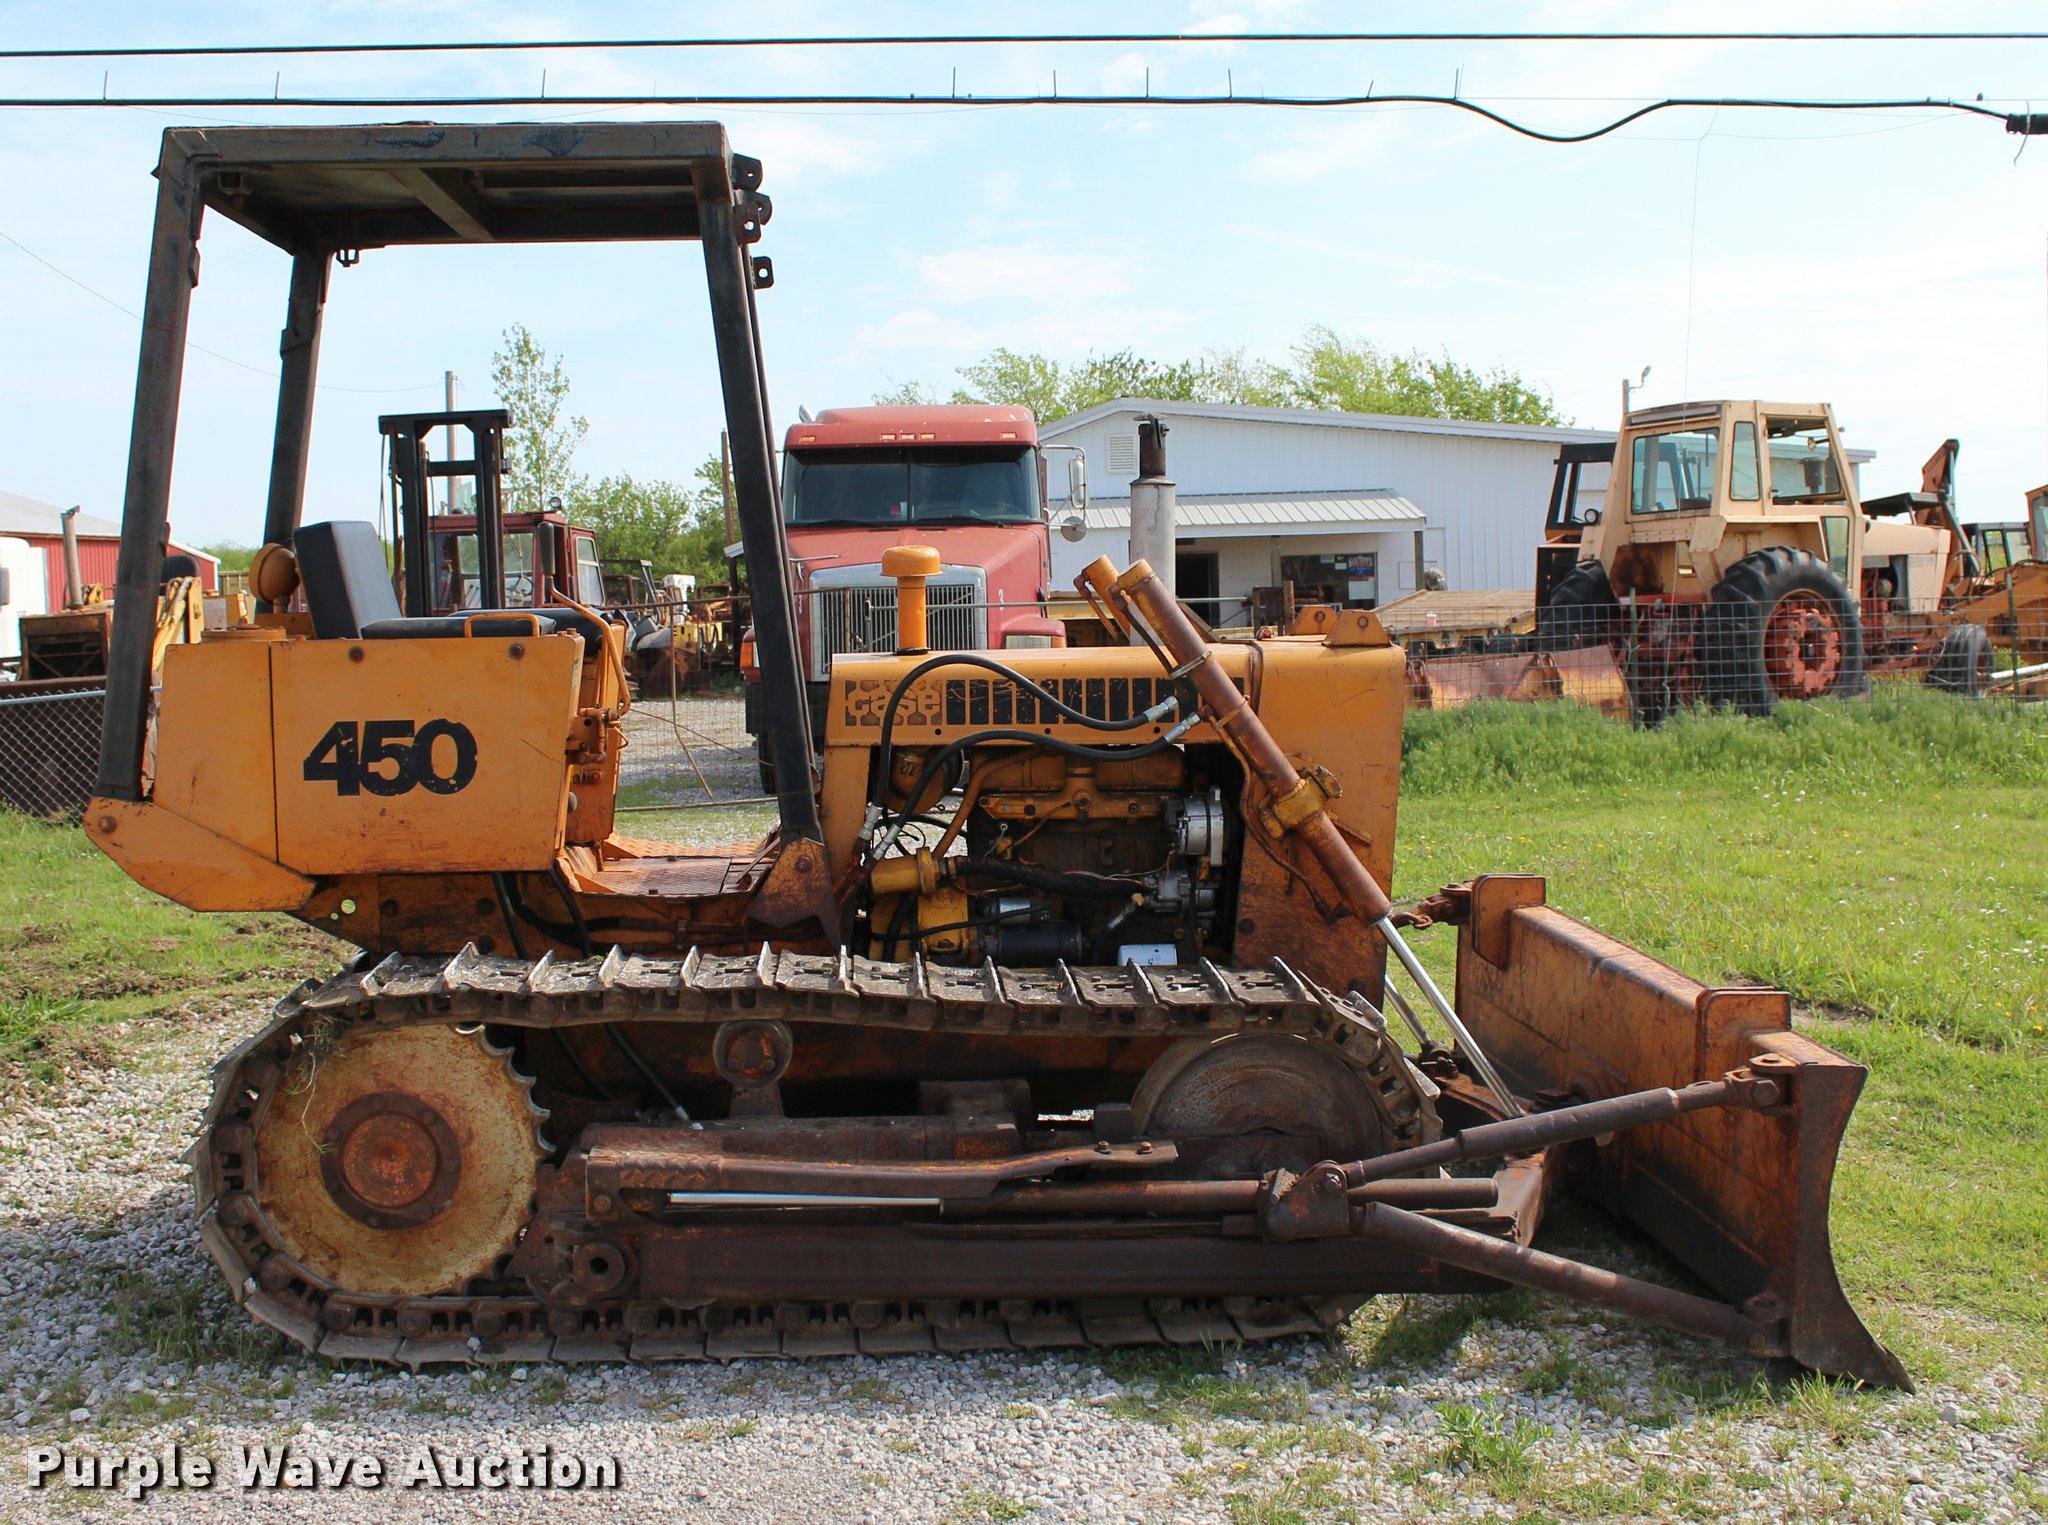 1974 Case 450 dozer | Item L4987 | SOLD! May 11 Construction